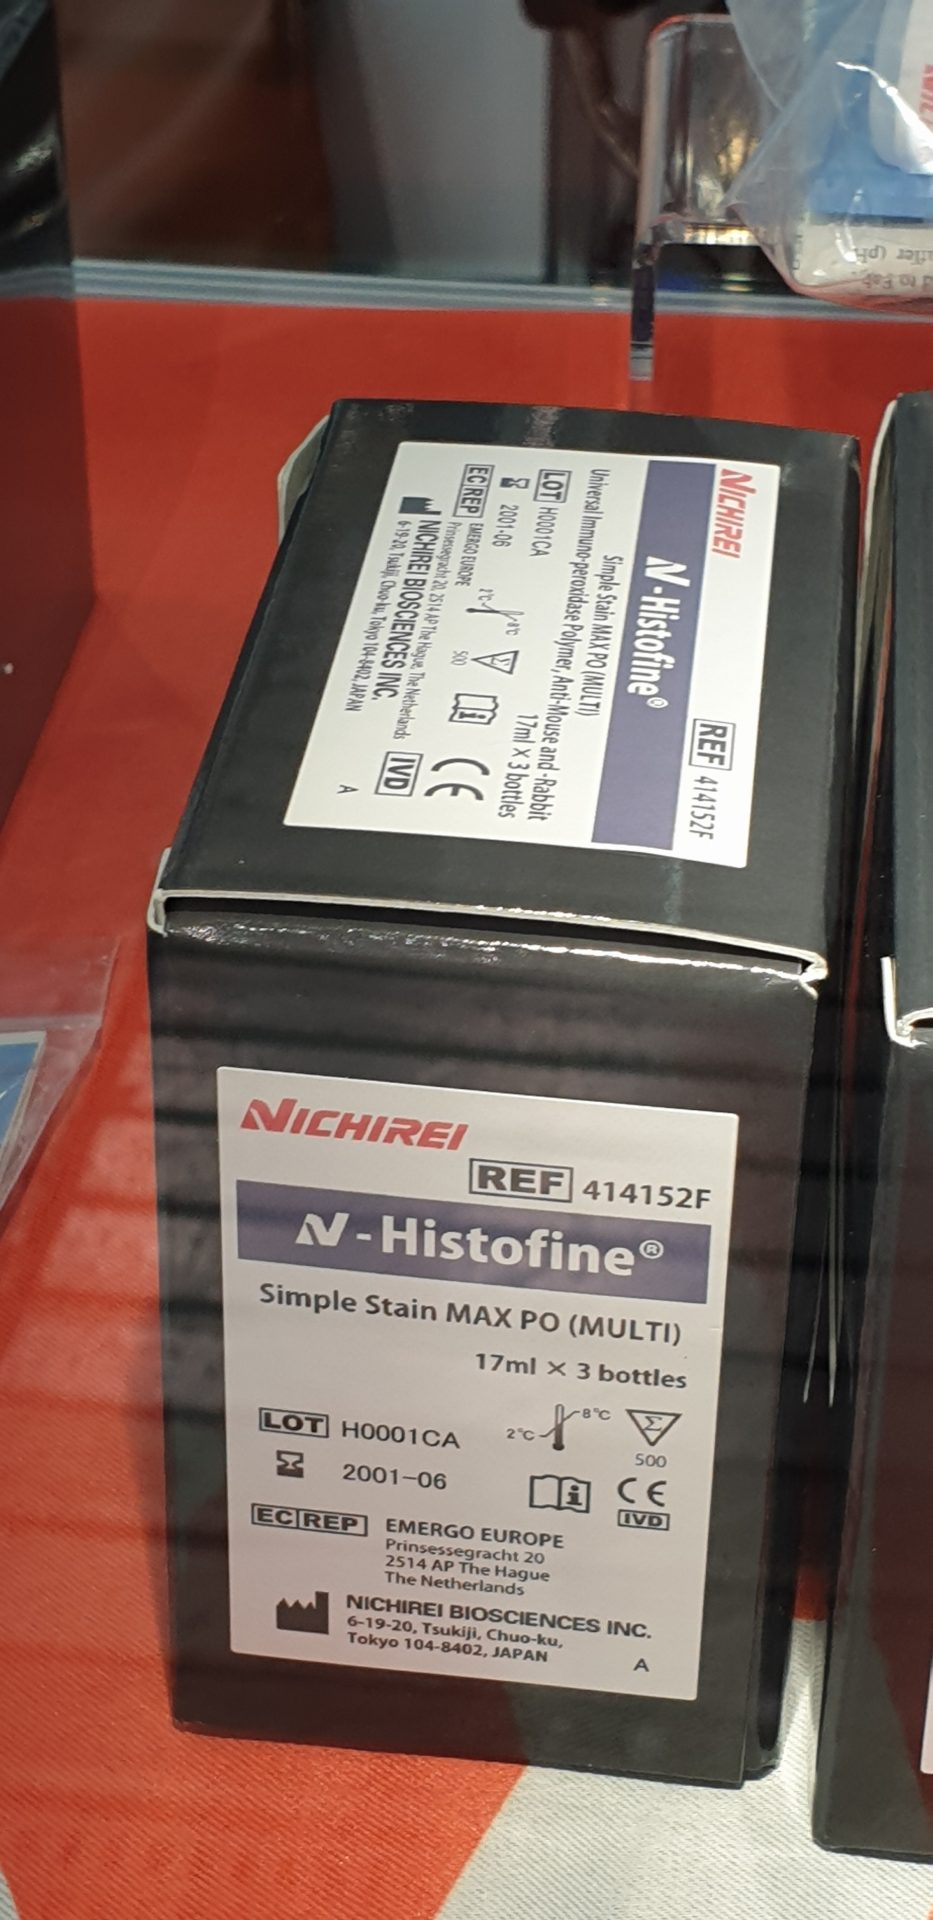 Histofine Nichirei